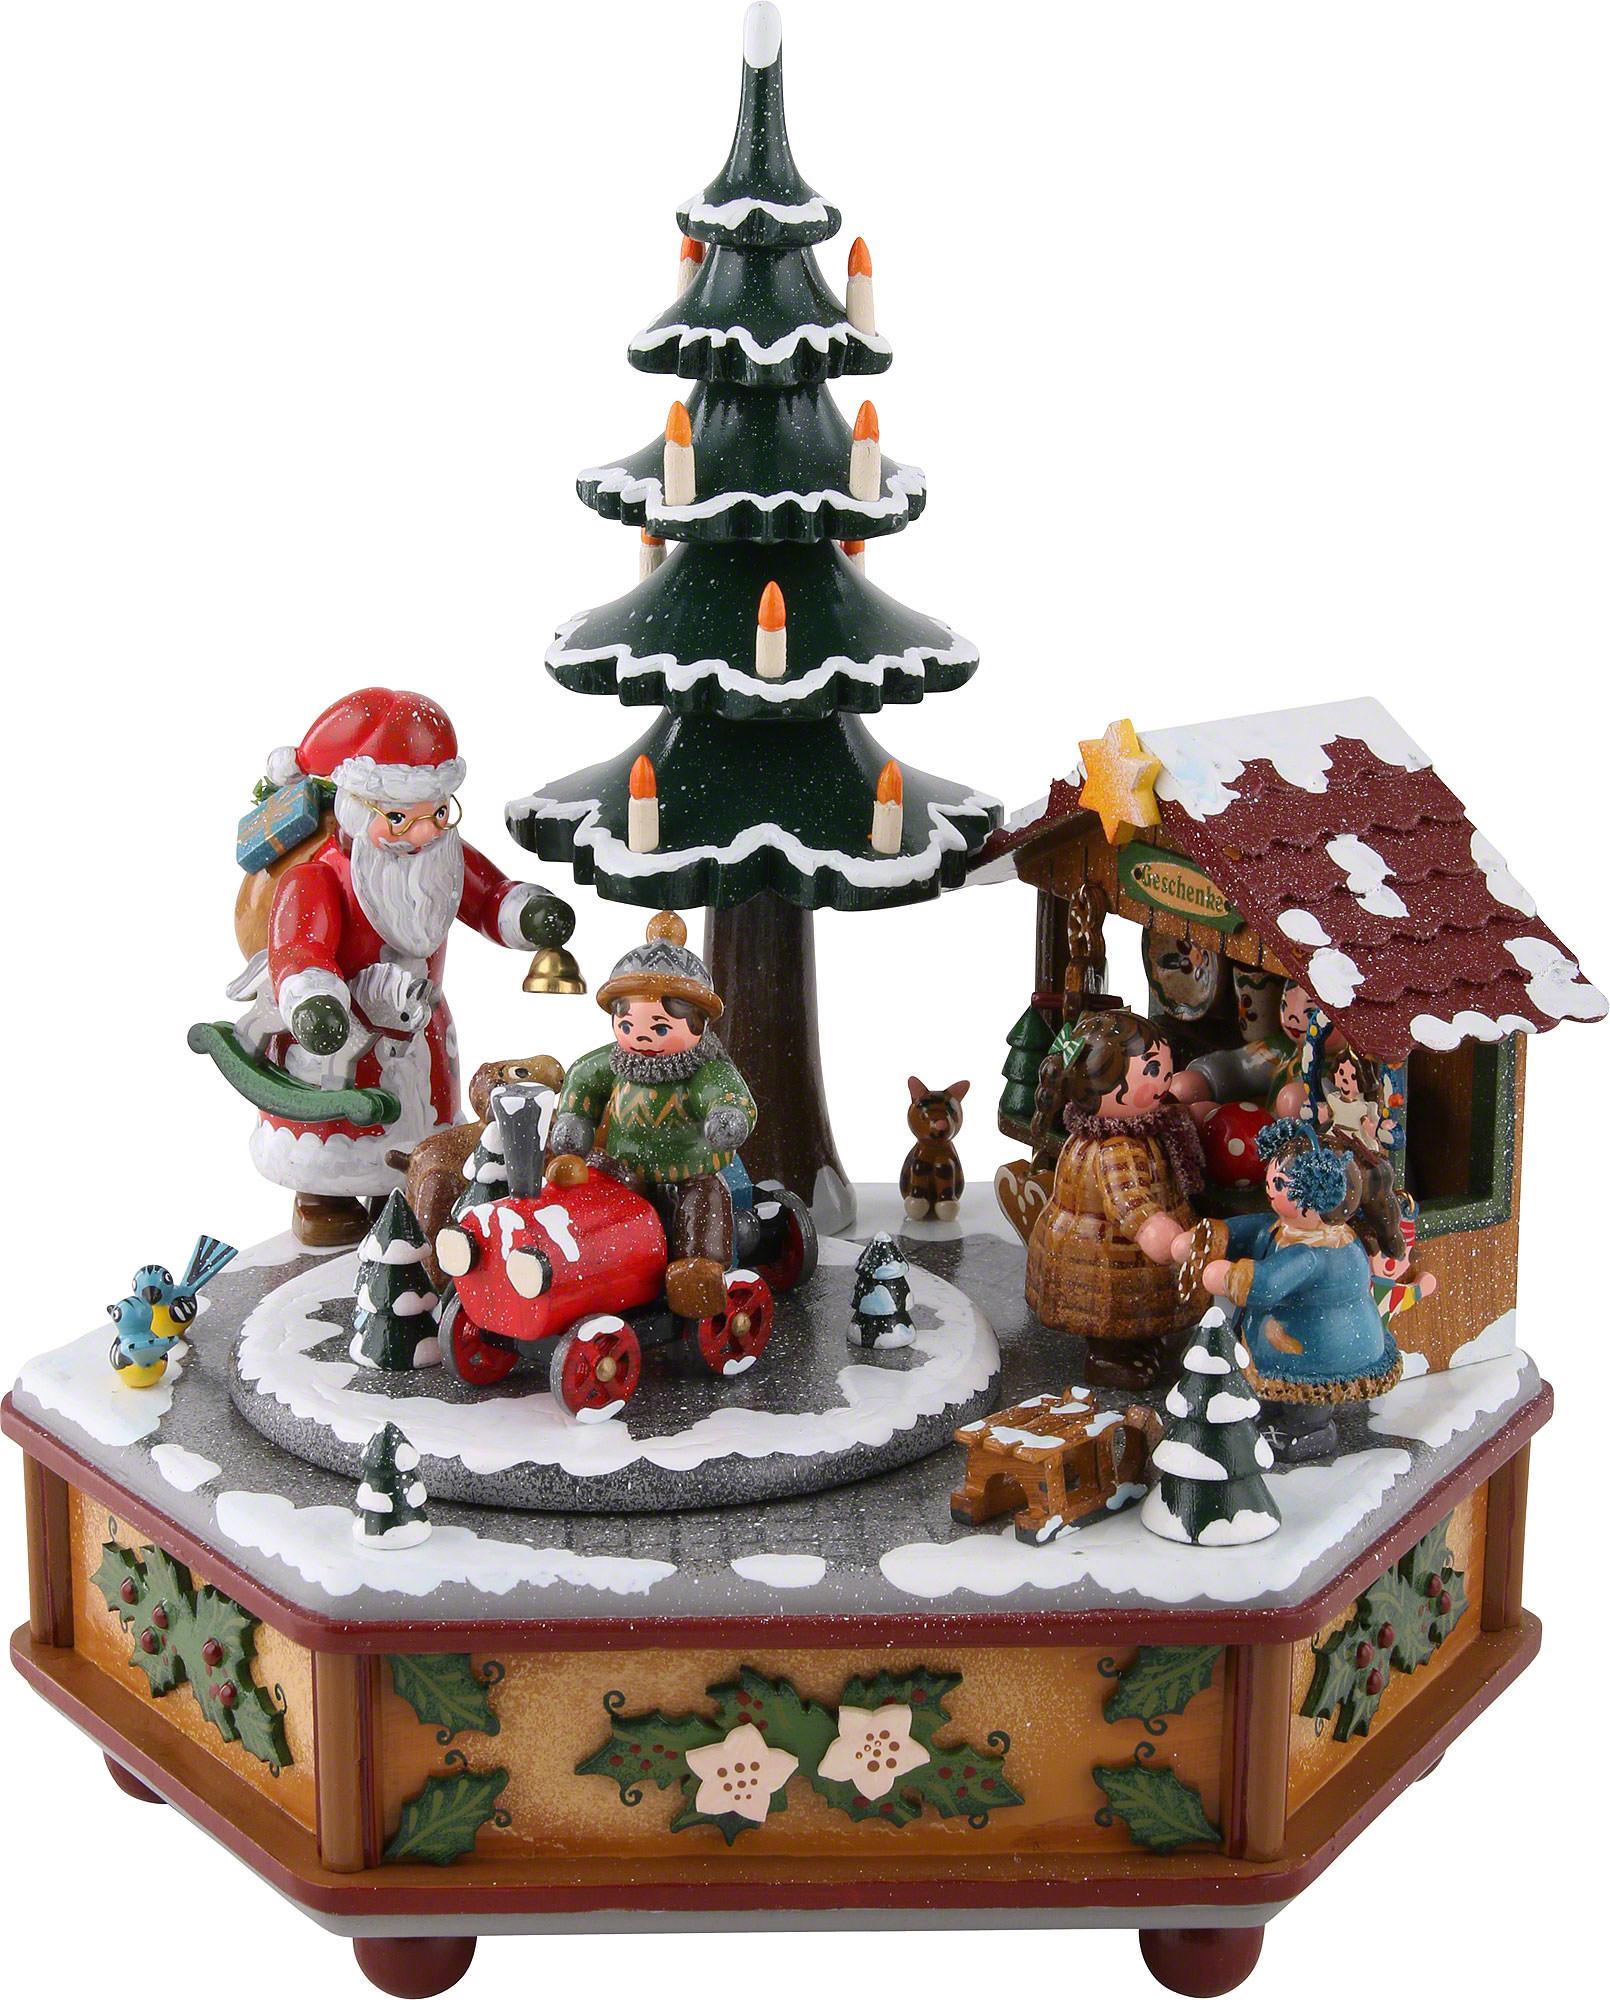 Musical Christmas Ornaments That Play Music - Music box christmas 22 cm 9 inch